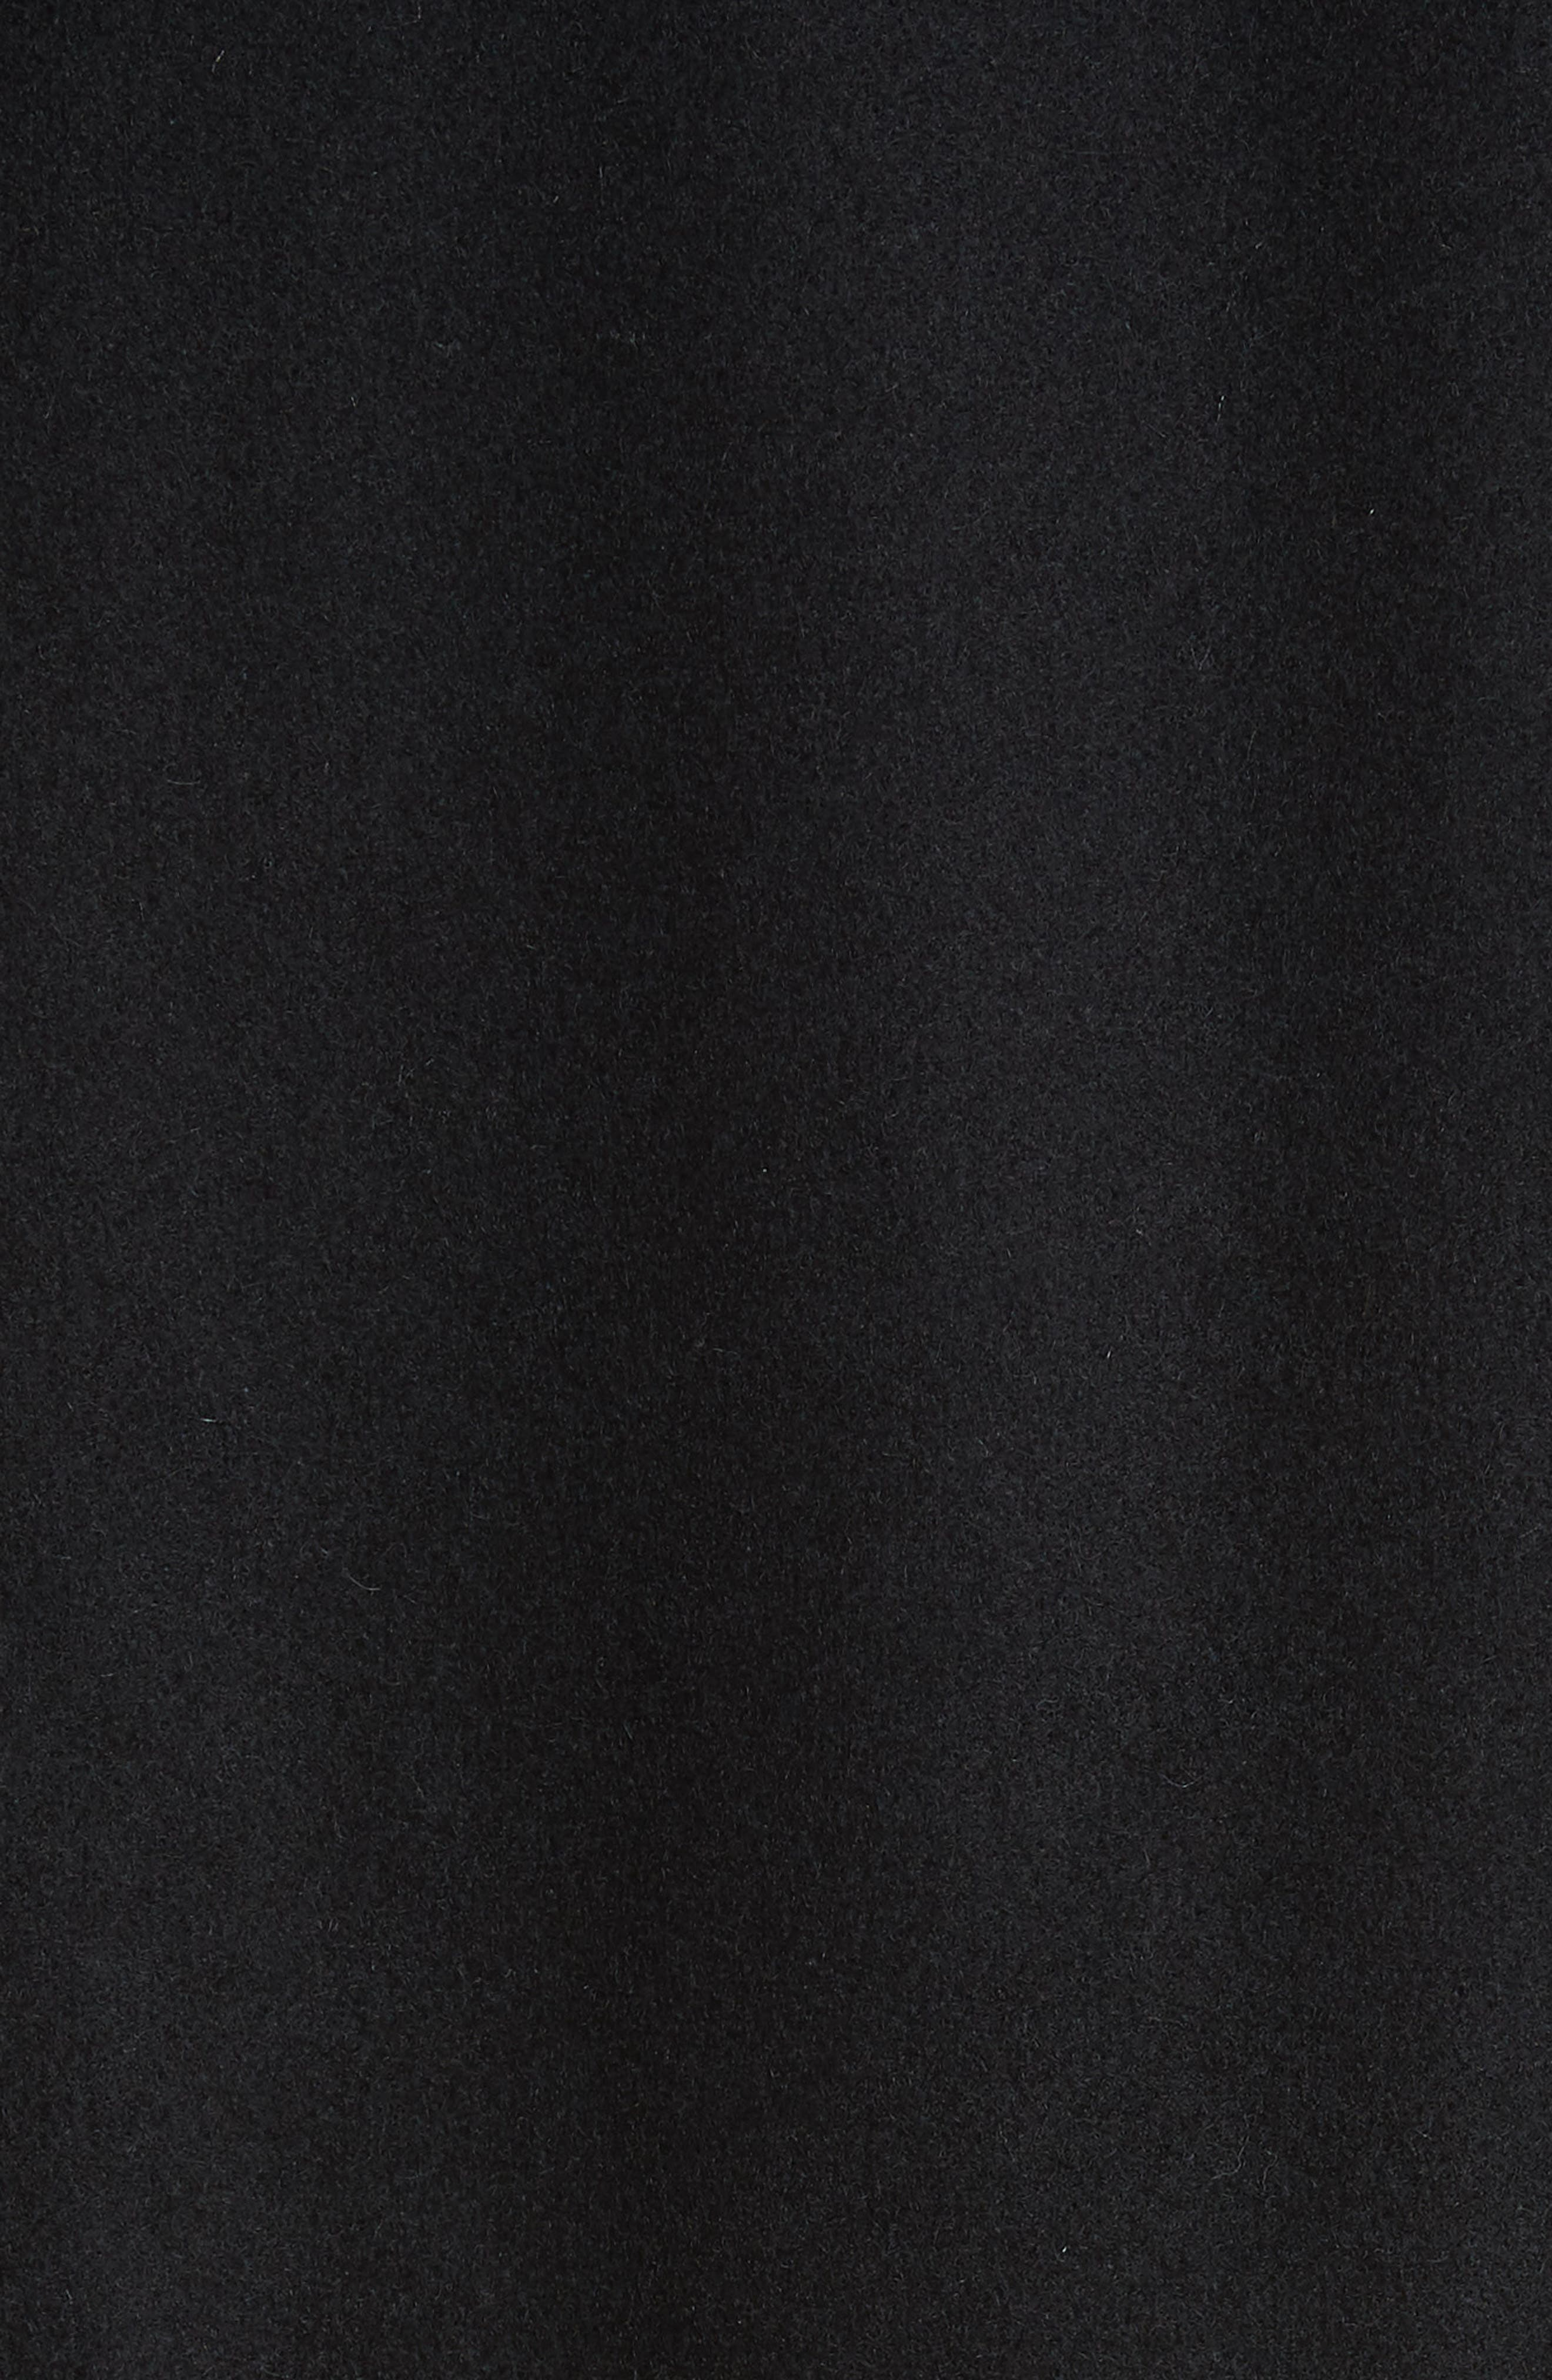 Verreli Hooded Parka with Faux Fur Trim,                             Alternate thumbnail 7, color,                             BLACK 900